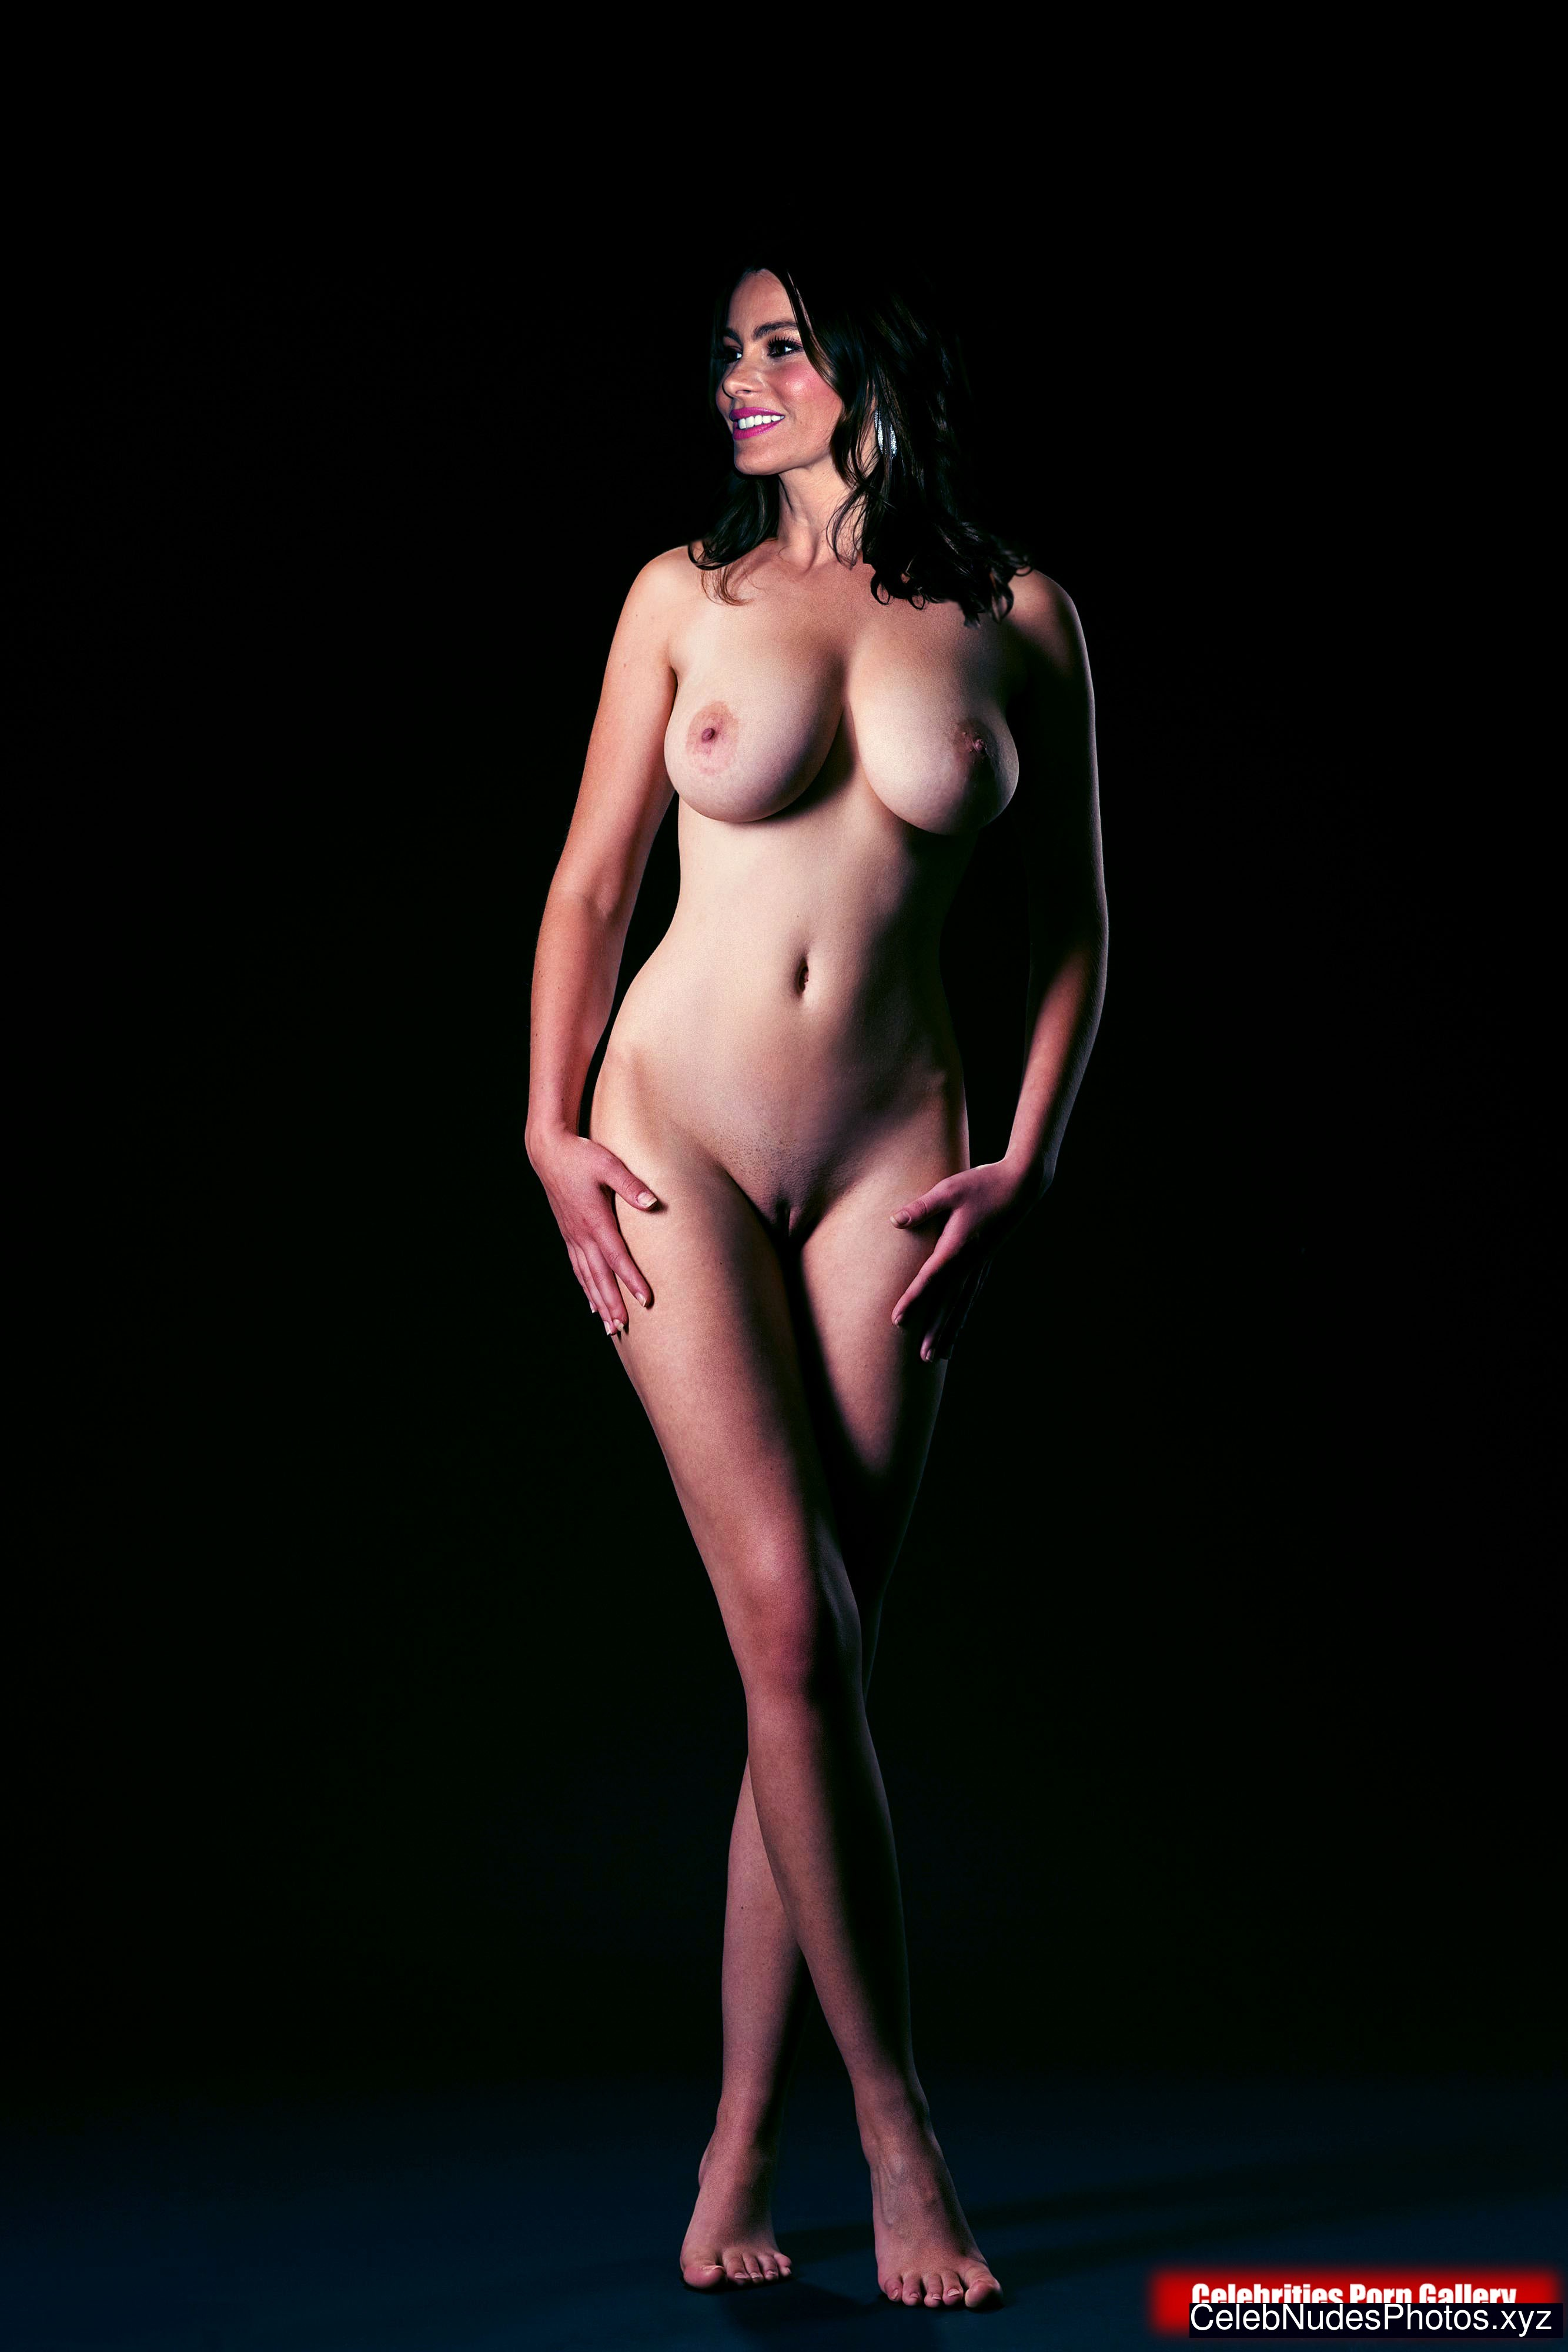 Celebrity Vergara Nude Pictures